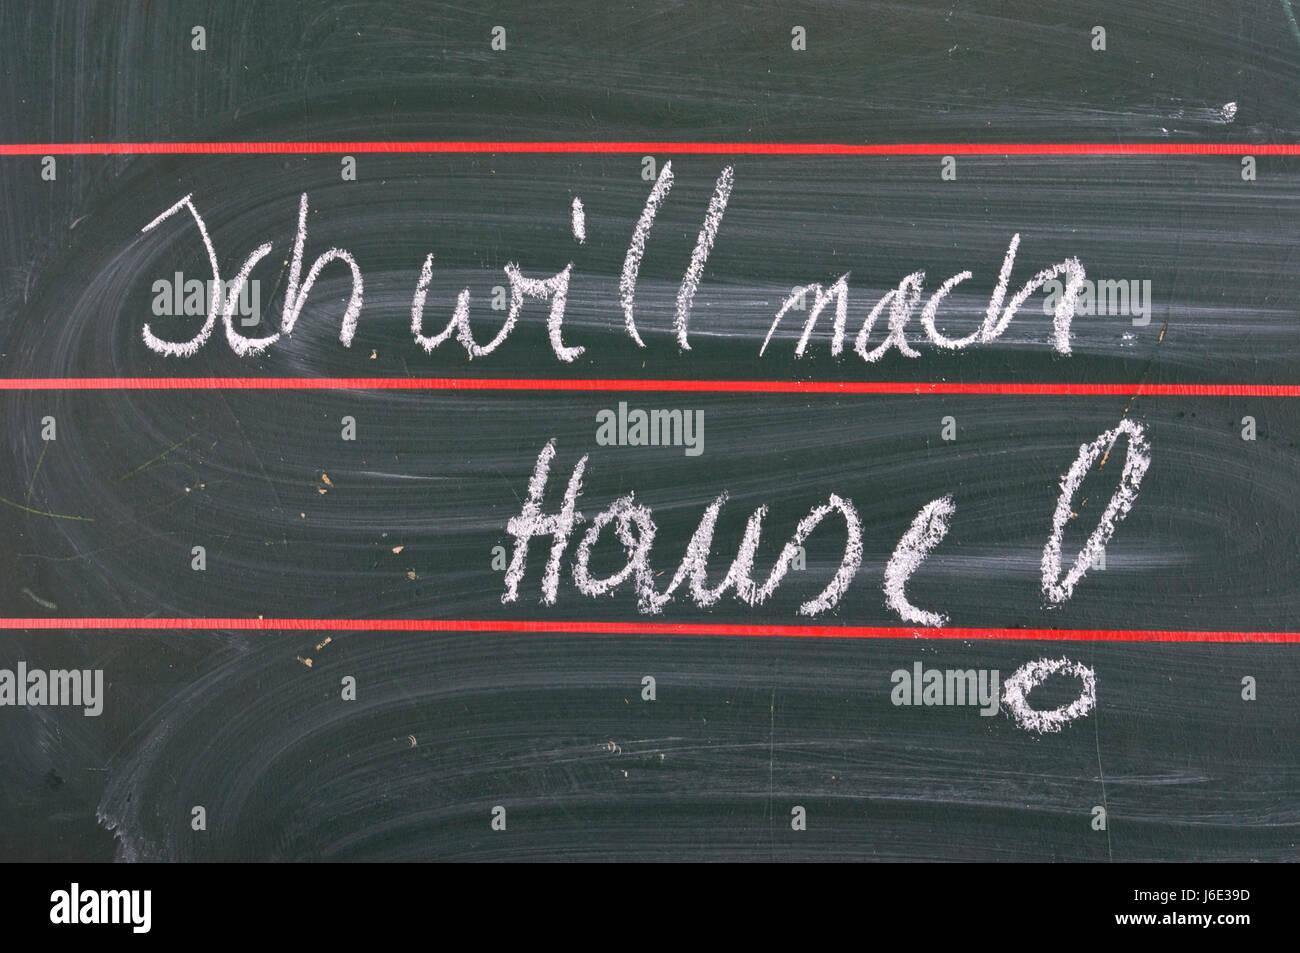 homesickness - Stock Image